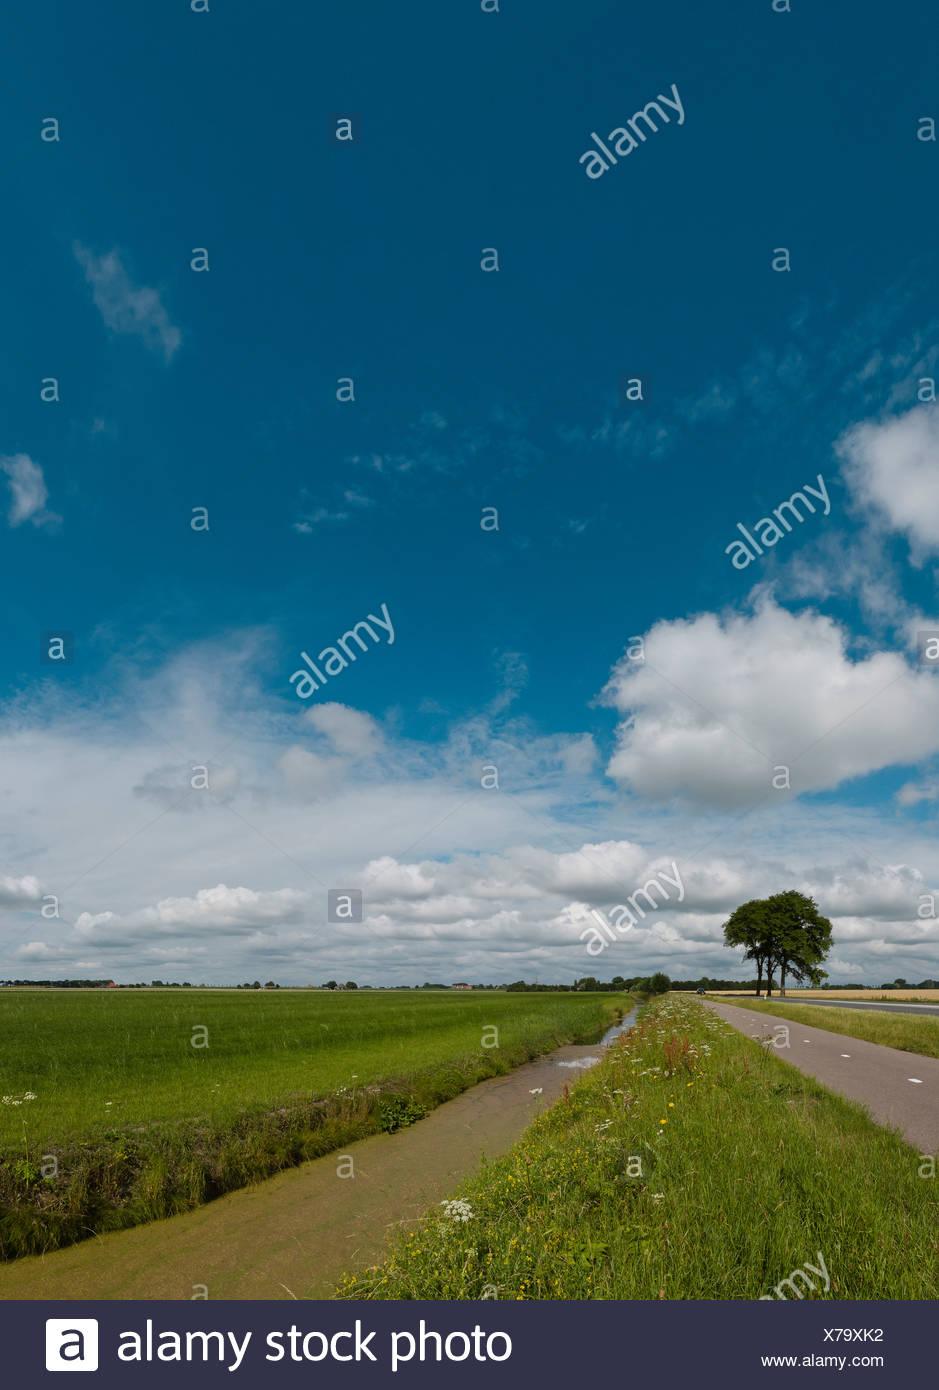 Netherlands, Europe, Holland, Noordbeemster, Polder, De Beemster, landscape, field, meadow, summer, - Stock Image